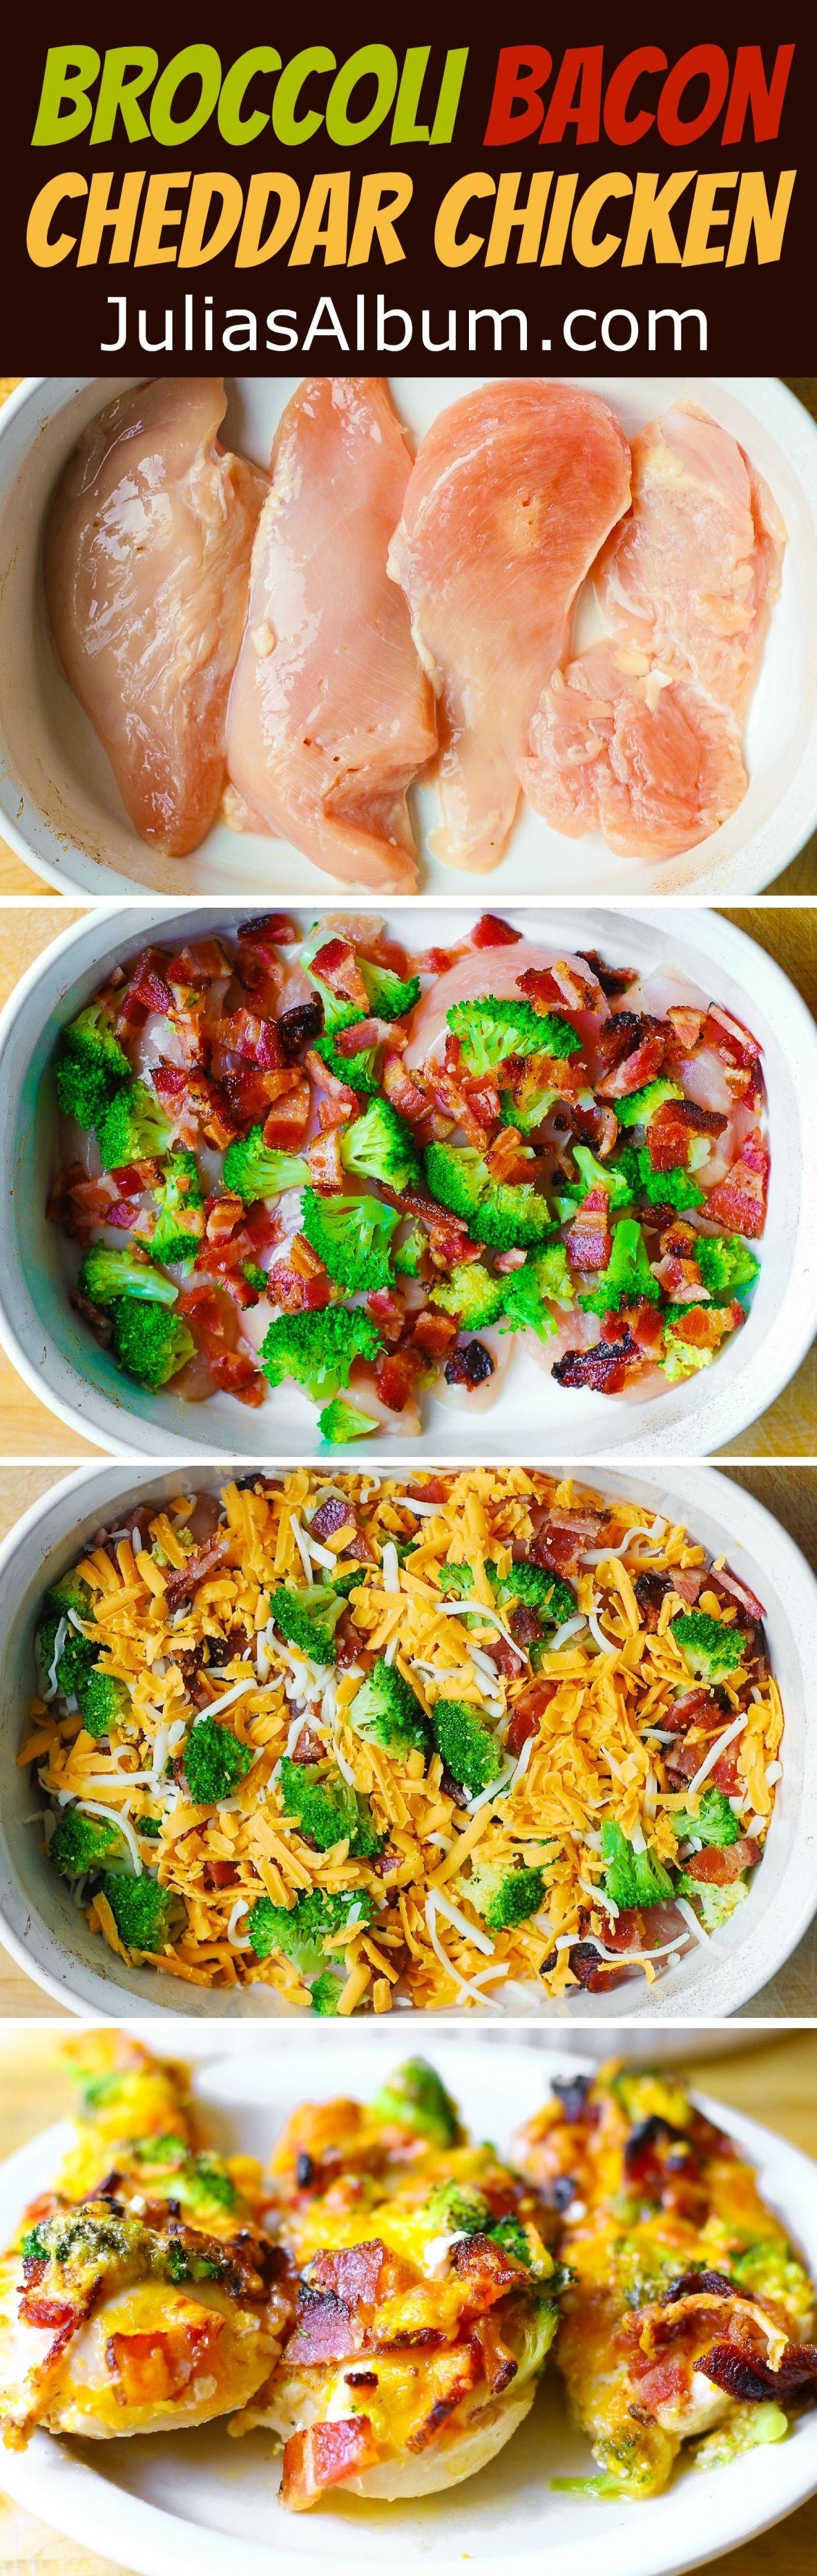 Broccoli Bacon Cheddar Chicken Recipe Keto Pinterest Recipes